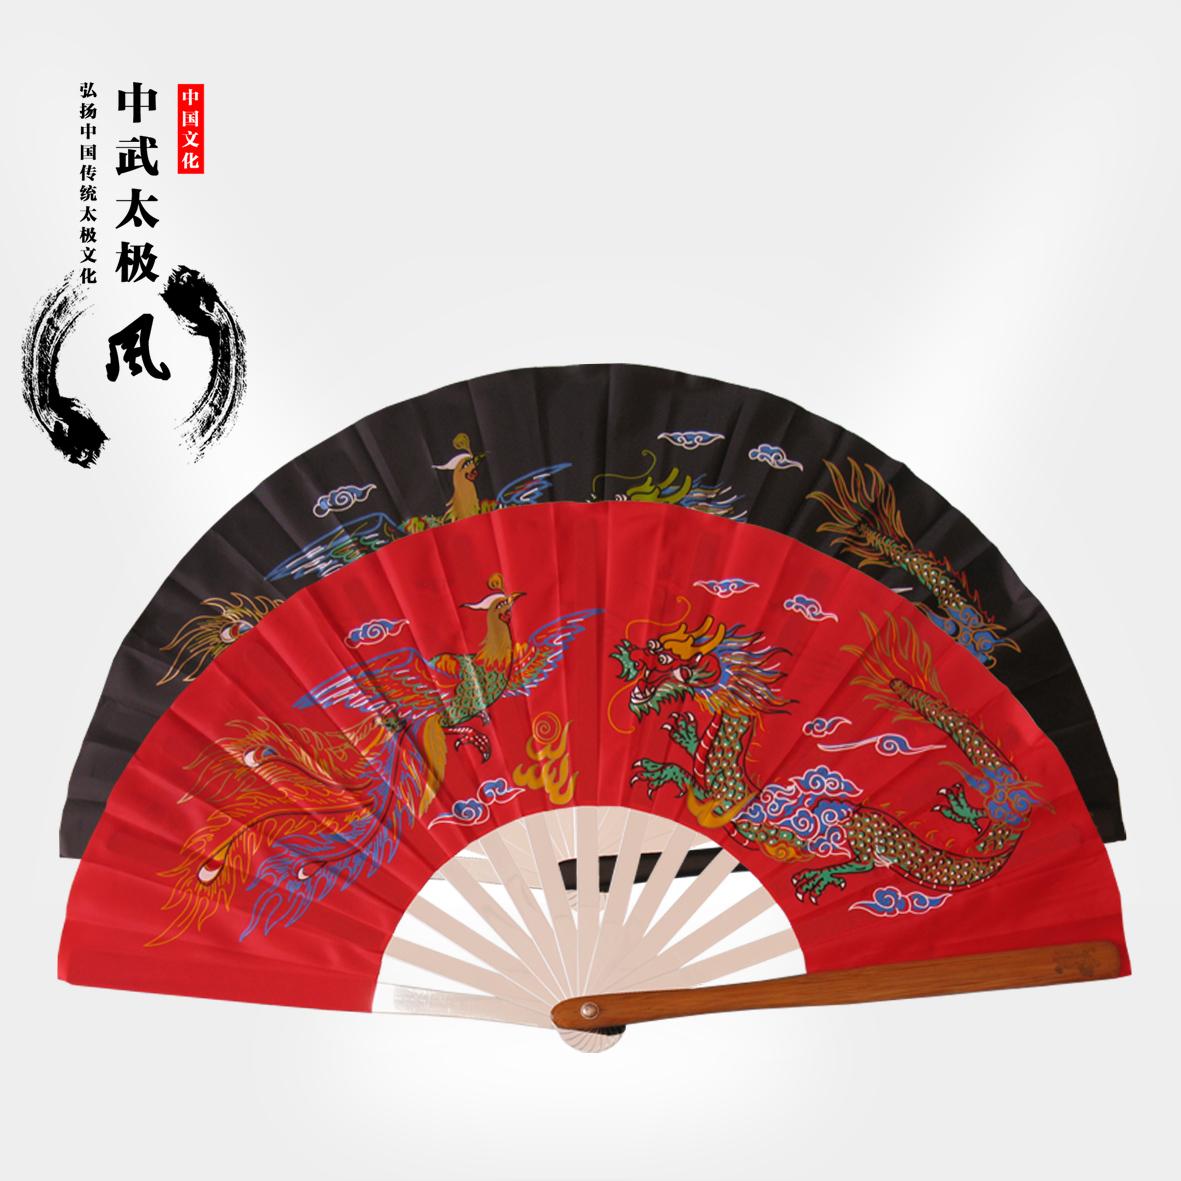 in the stainless steel stainless steel fan performance fan stainless steel bone kung fu fan manufacturers direct sales<br><br>Aliexpress